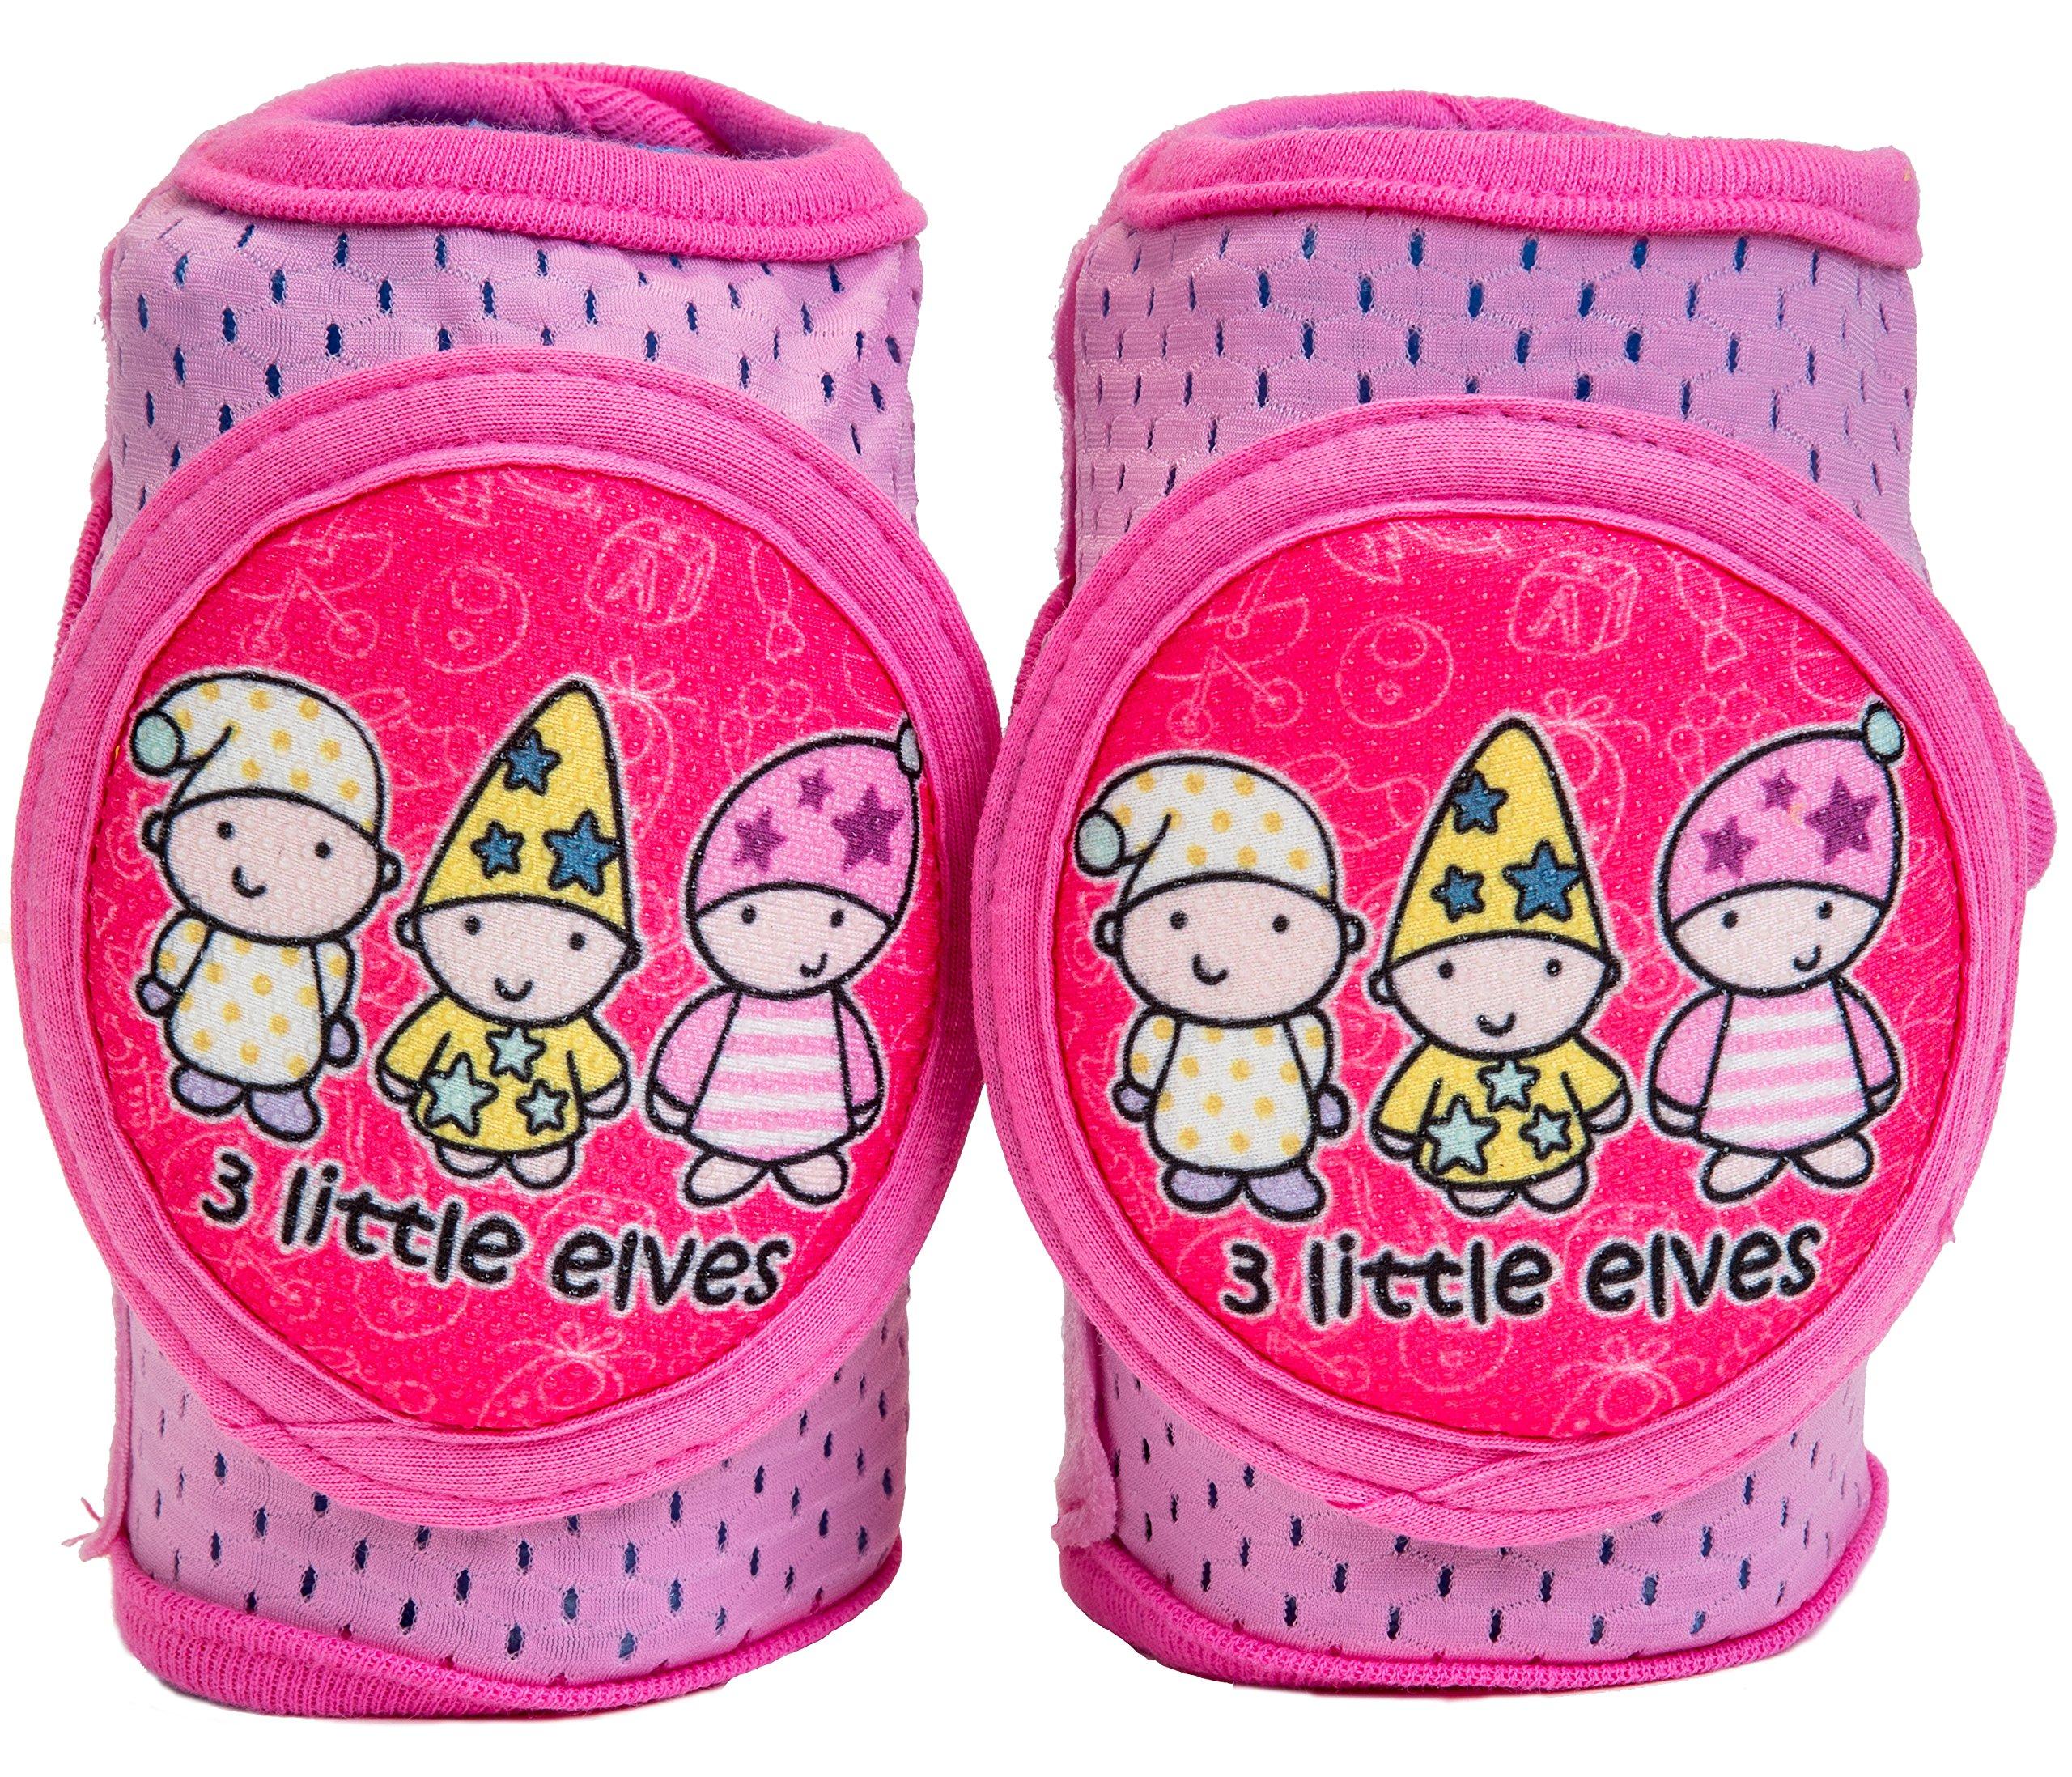 Baby Knee Pads Anti-Slip Walking Kneepads Adjustable Hook & Loop Strap Unisex For Boys Girls Infant Toddler Knee & Elbow Pads Memory Foam Pad Cushion Breathable Mesh Fabric Knee Pads For Babies by Kstar (Image #5)